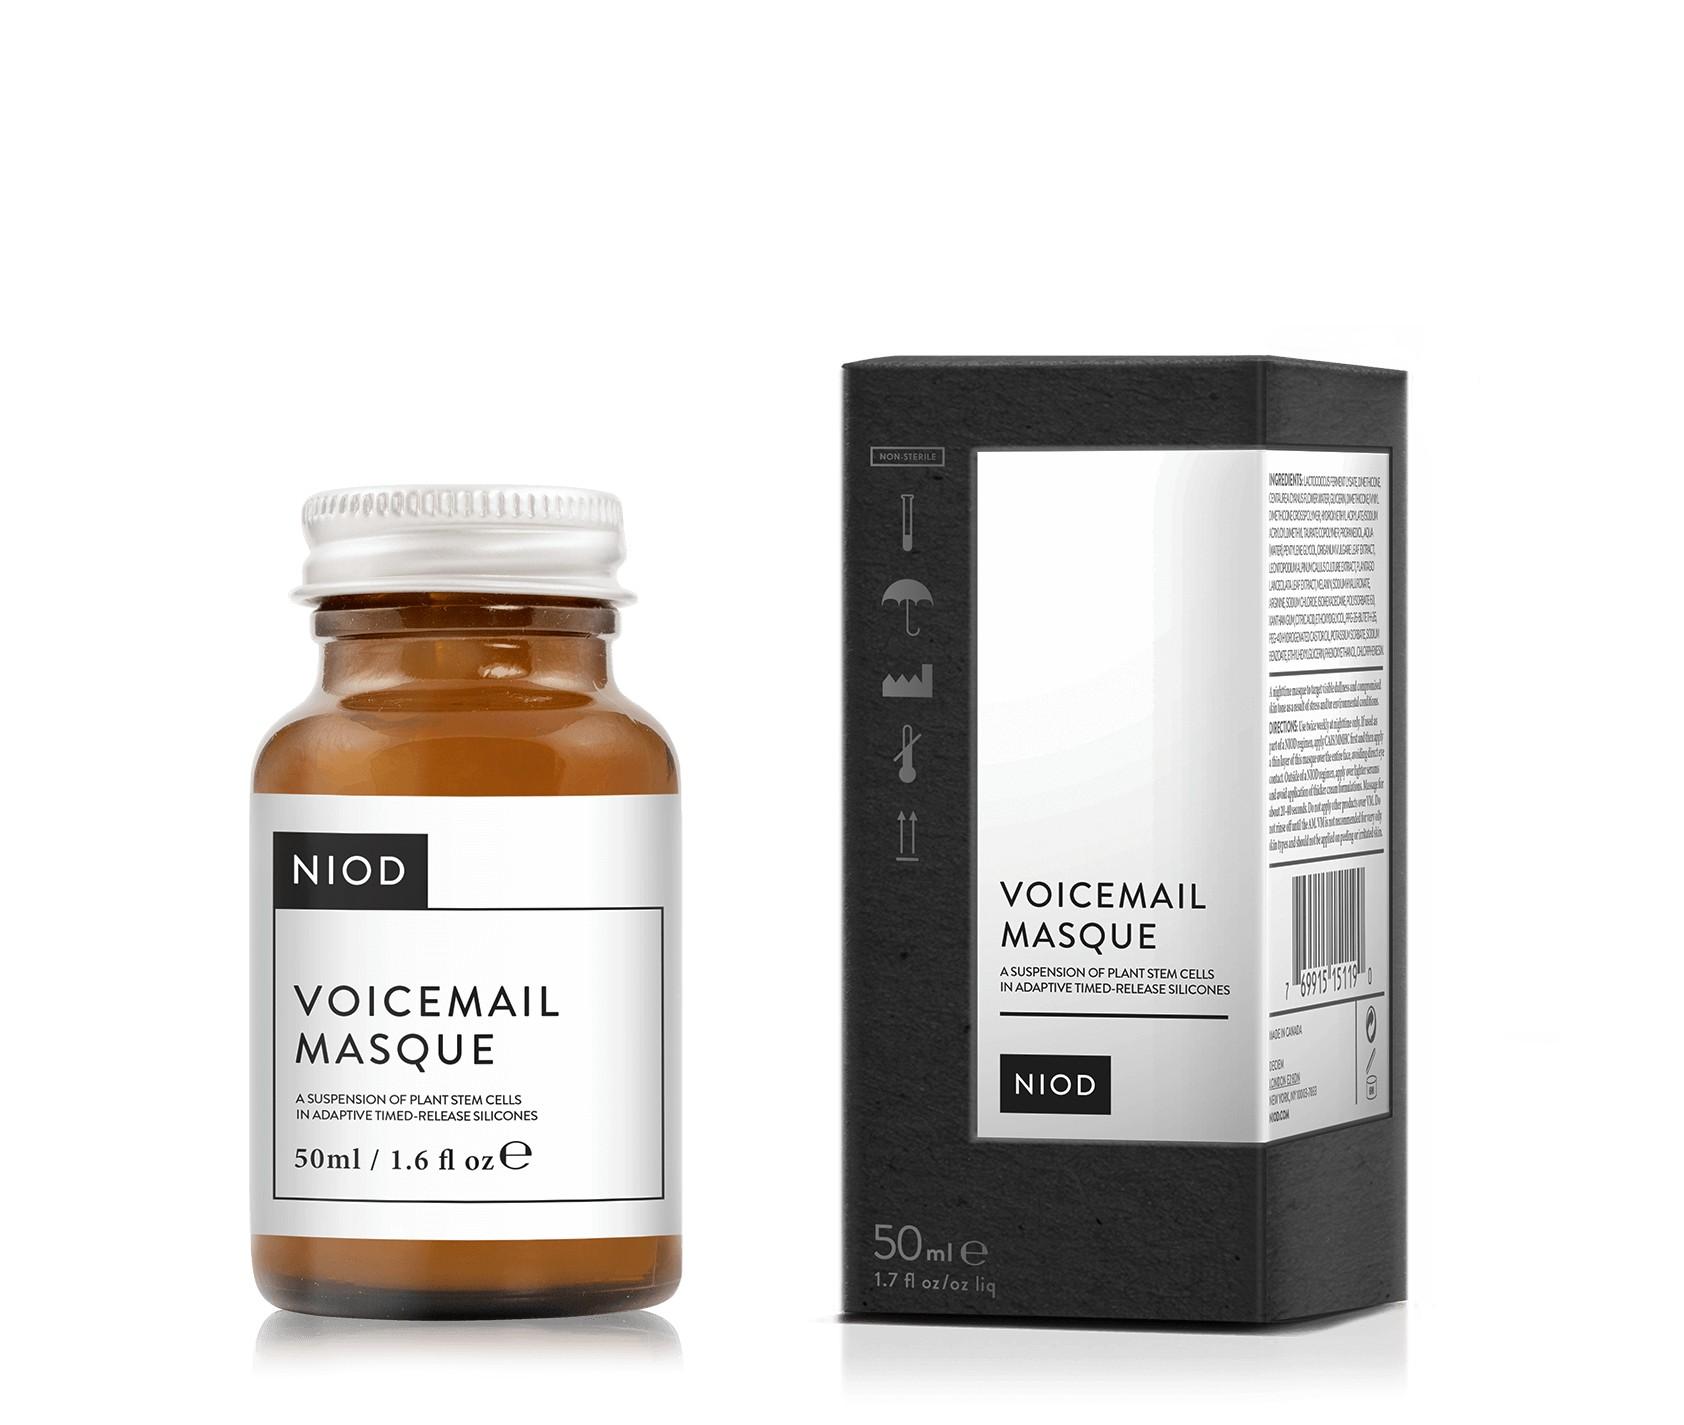 Voicemail Masque - NIOD